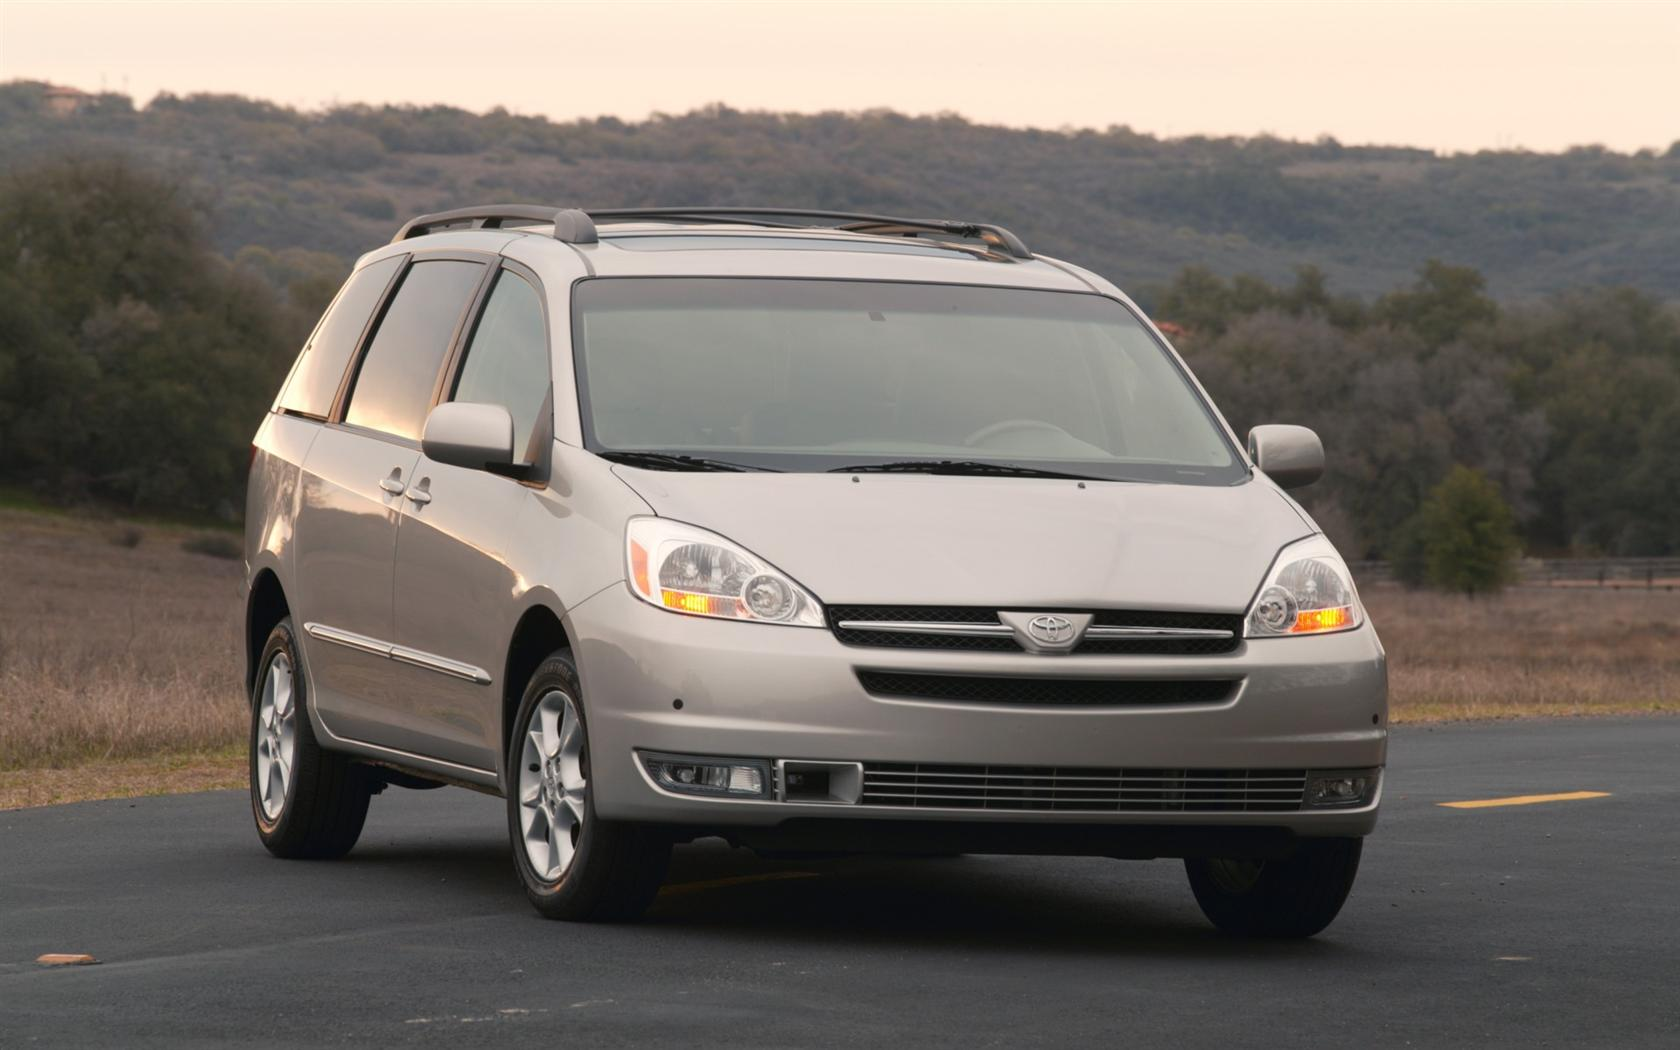 2005 Toyota Sienna Image 13